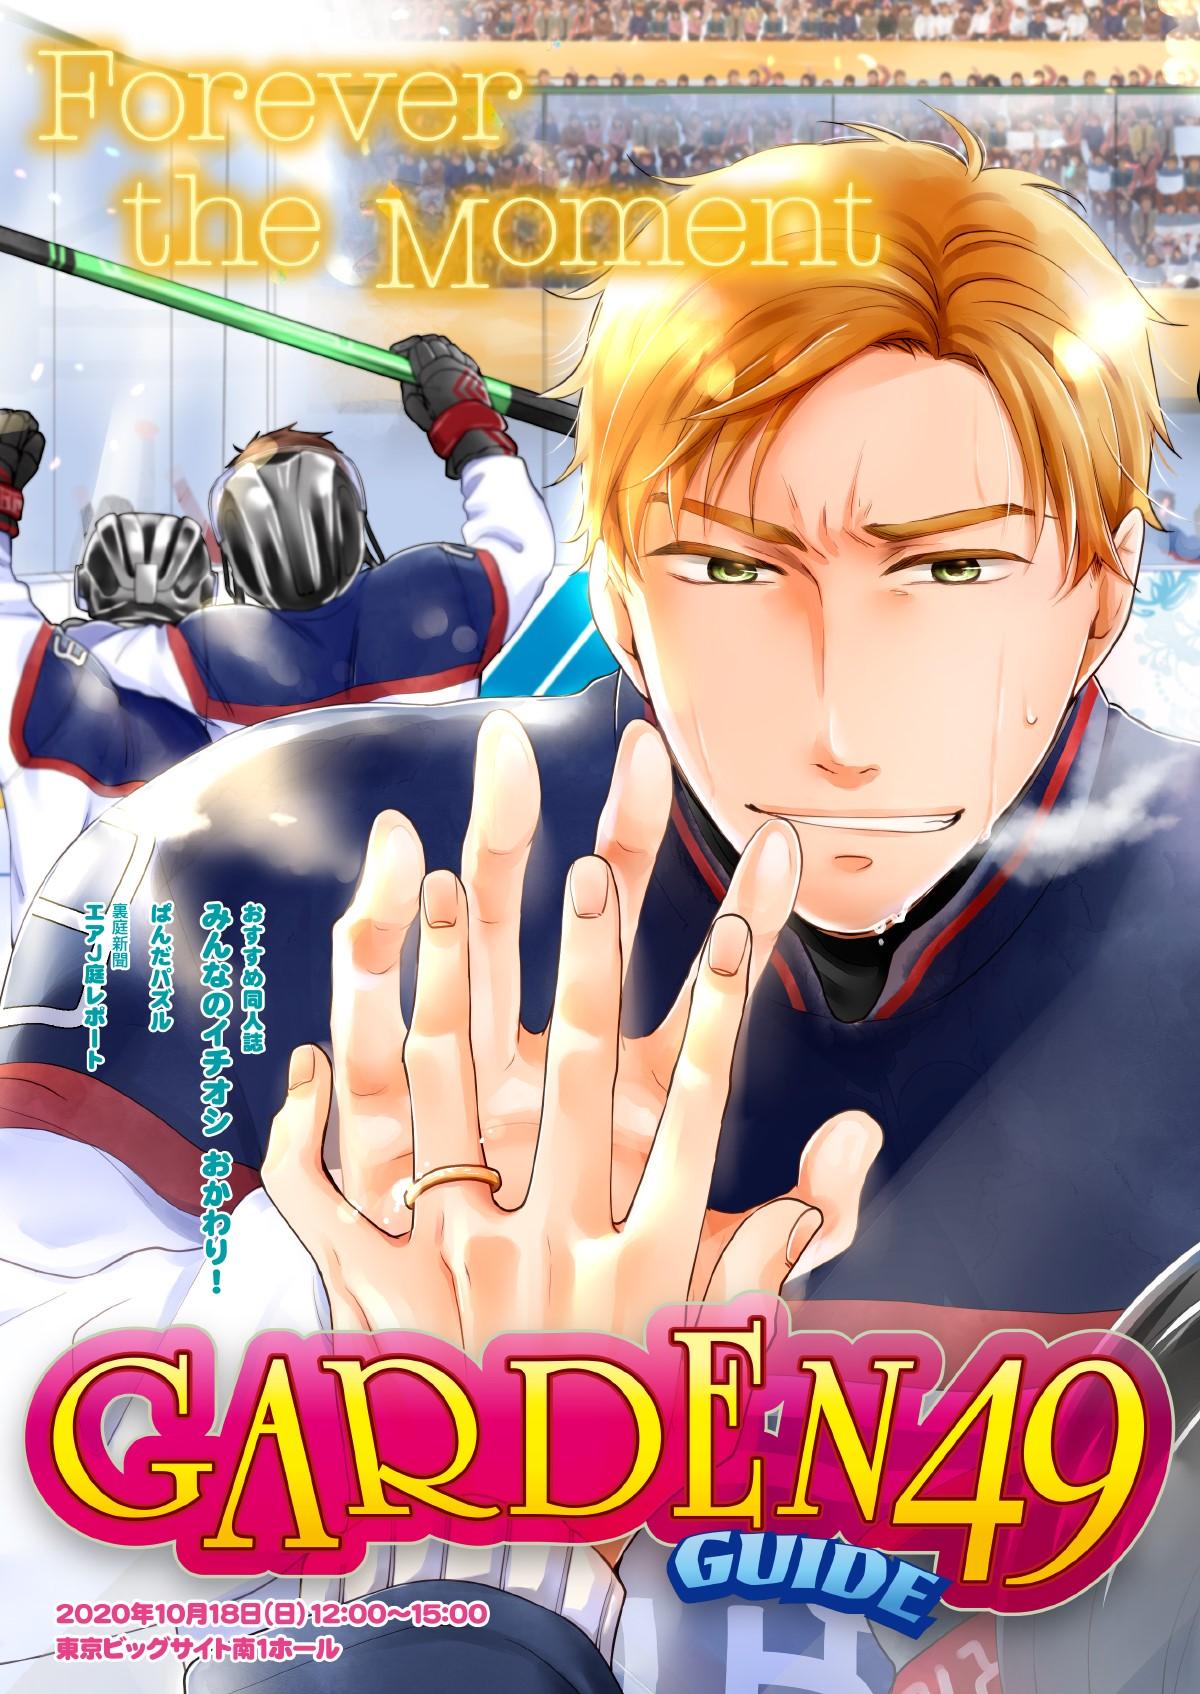 J.GARDEN パンフレット「ガーデンガイド49」